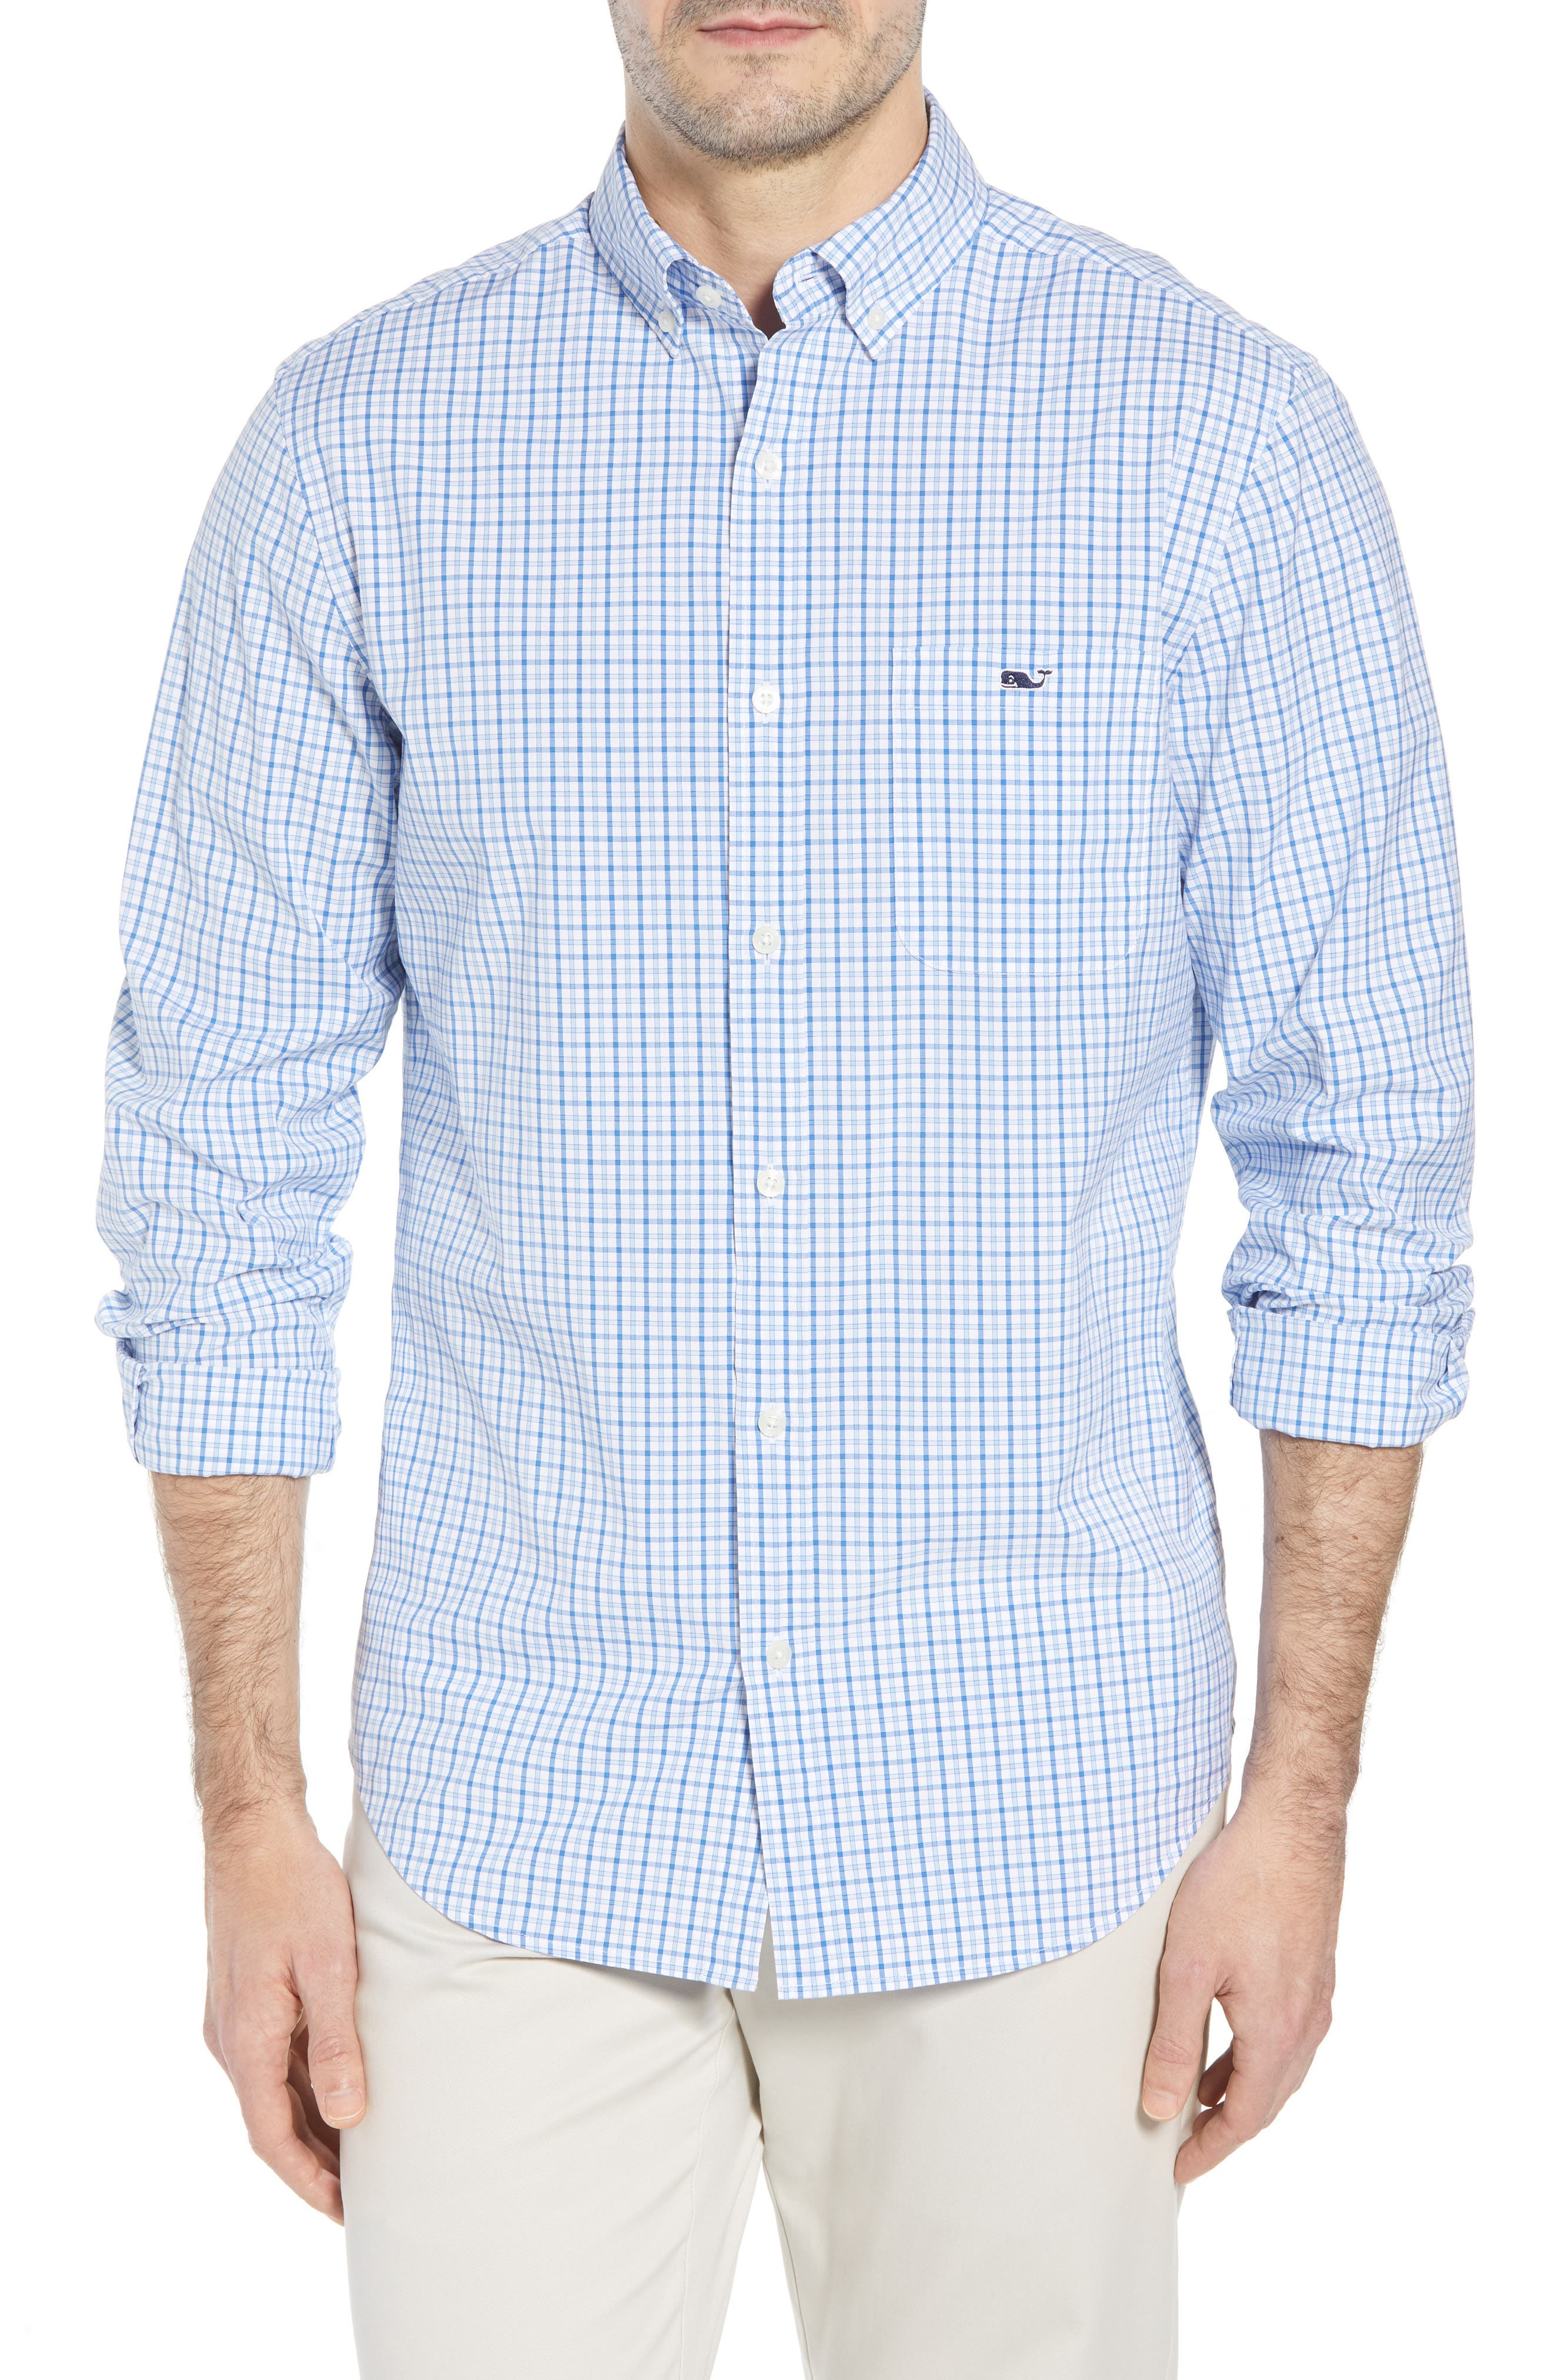 Clark Cove Tucker Classic Fit Check Sport Shirt,                         Main,                         color, Jake Blue